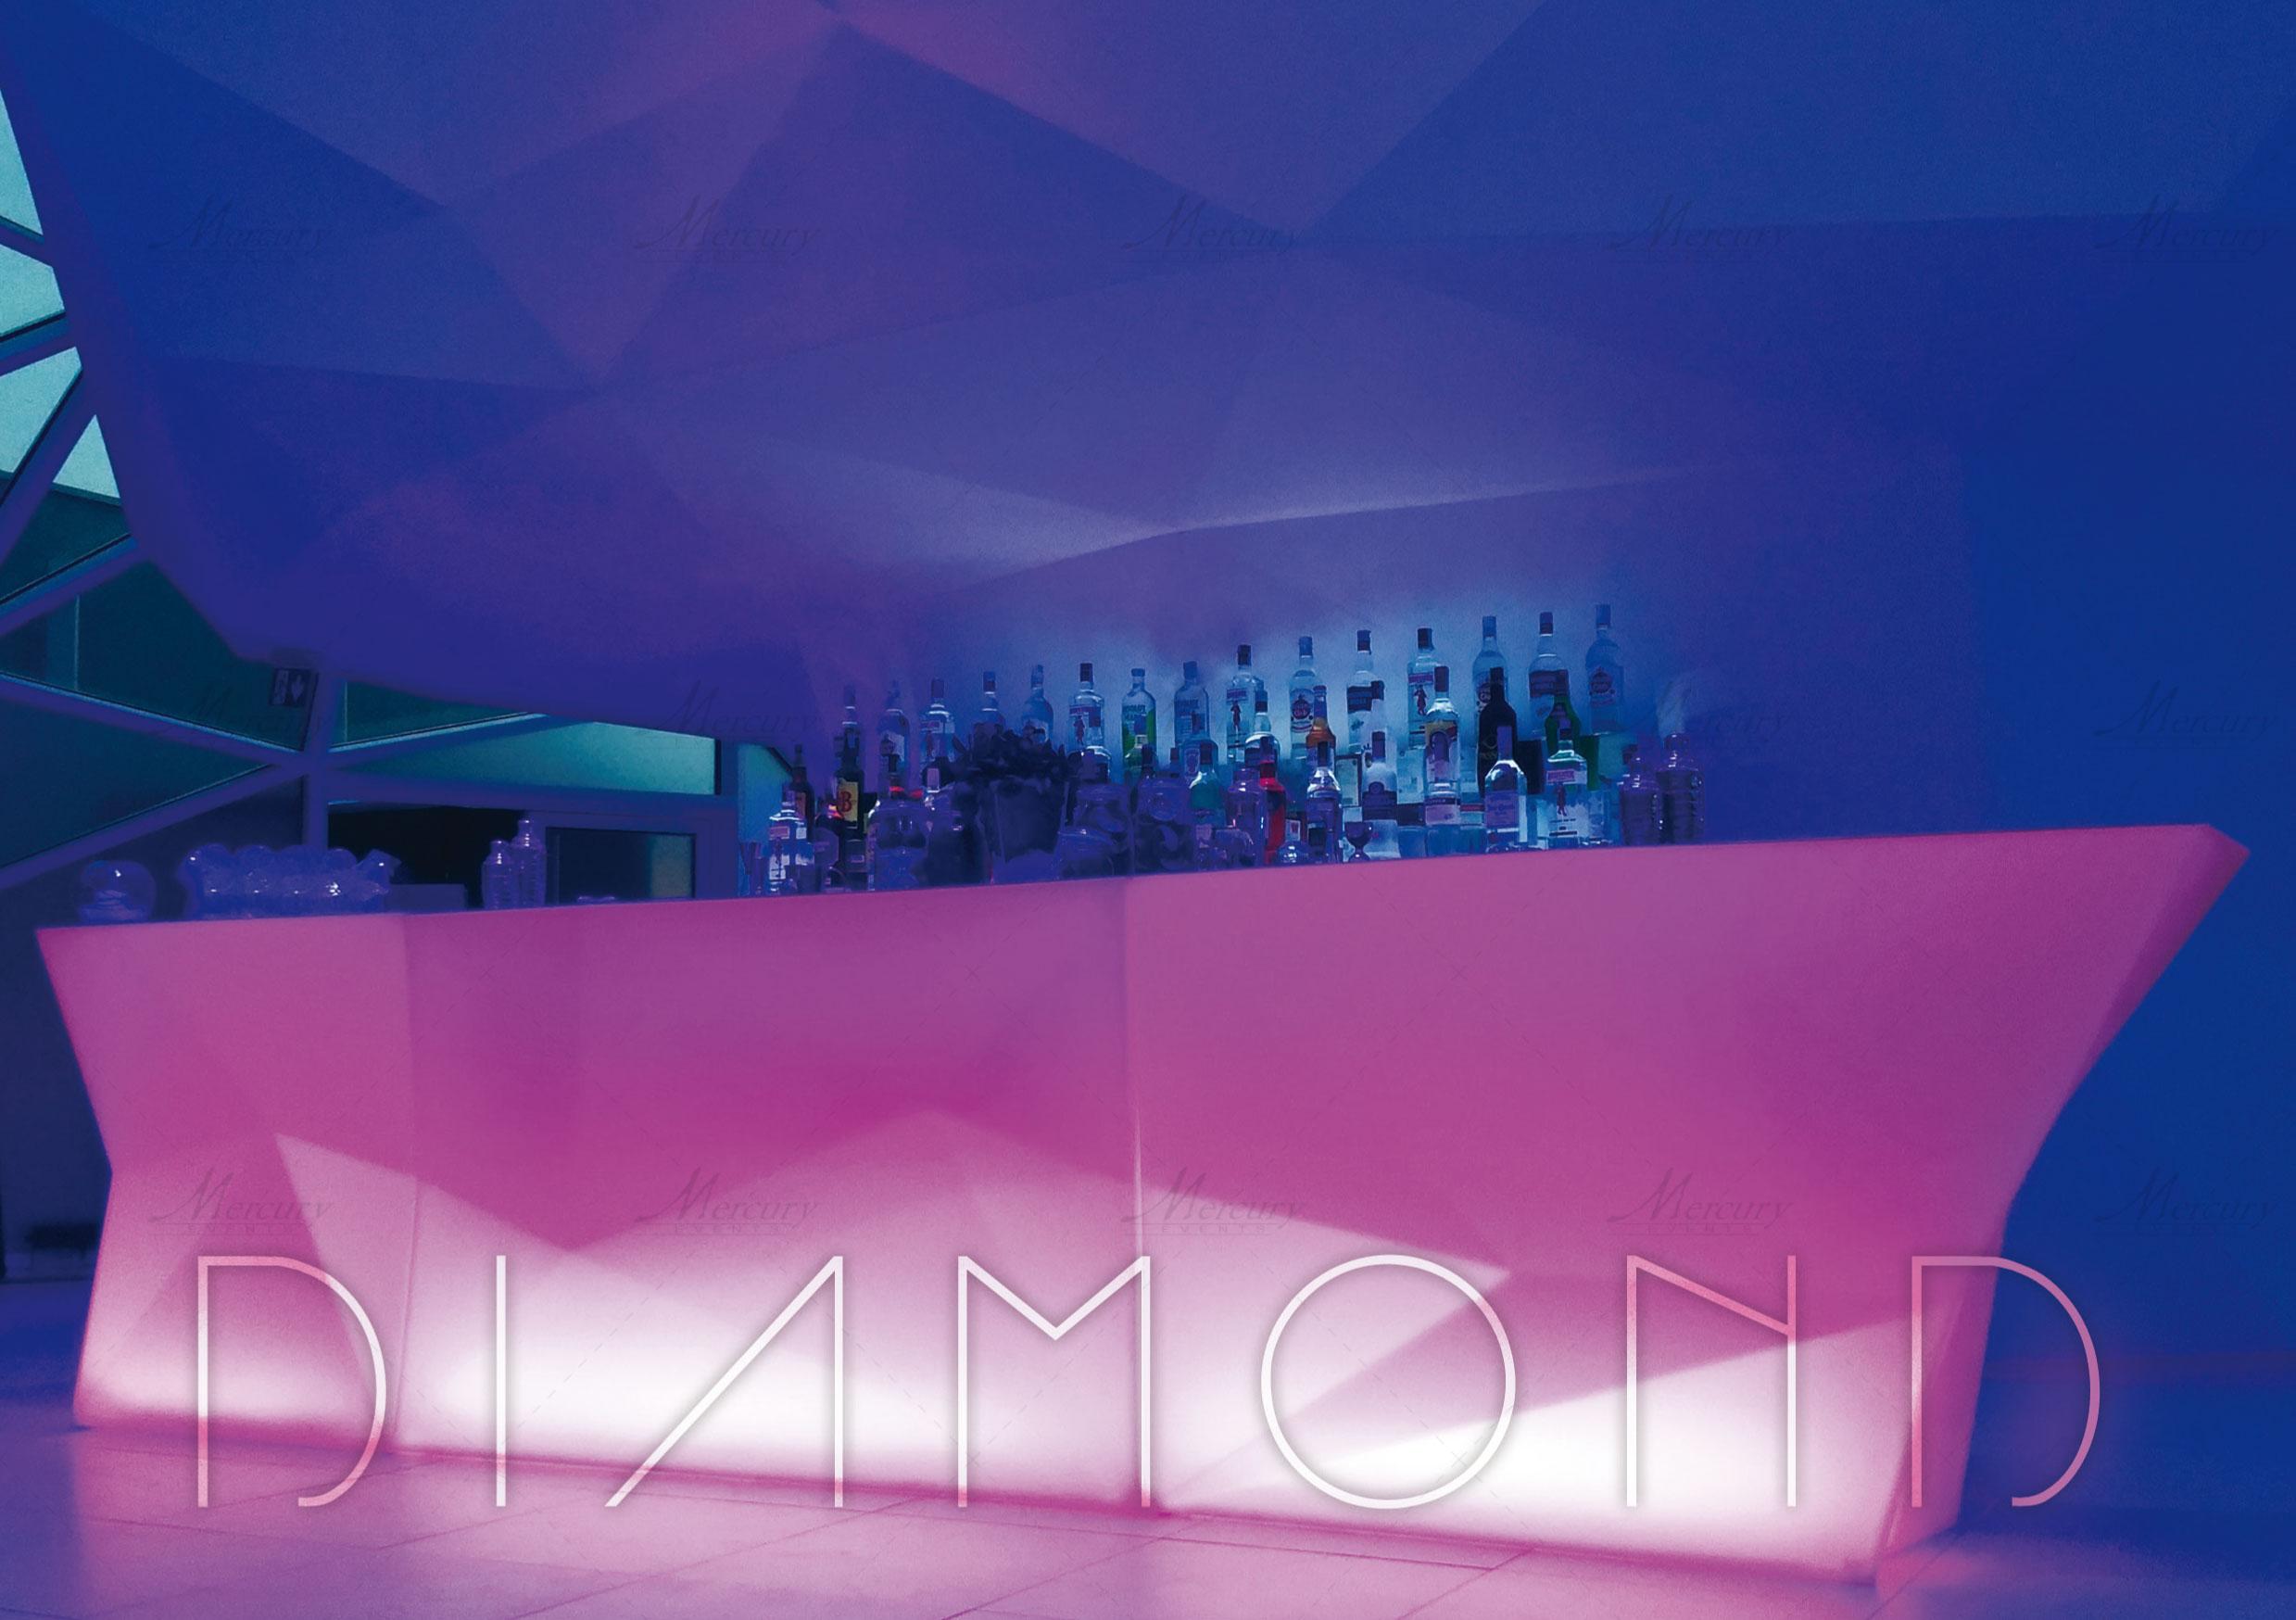 Bancone_bar_luminoso_bar_catering_la-lanterna_roma_mercury_events_01 PRADA Donna, Evento Open Bar